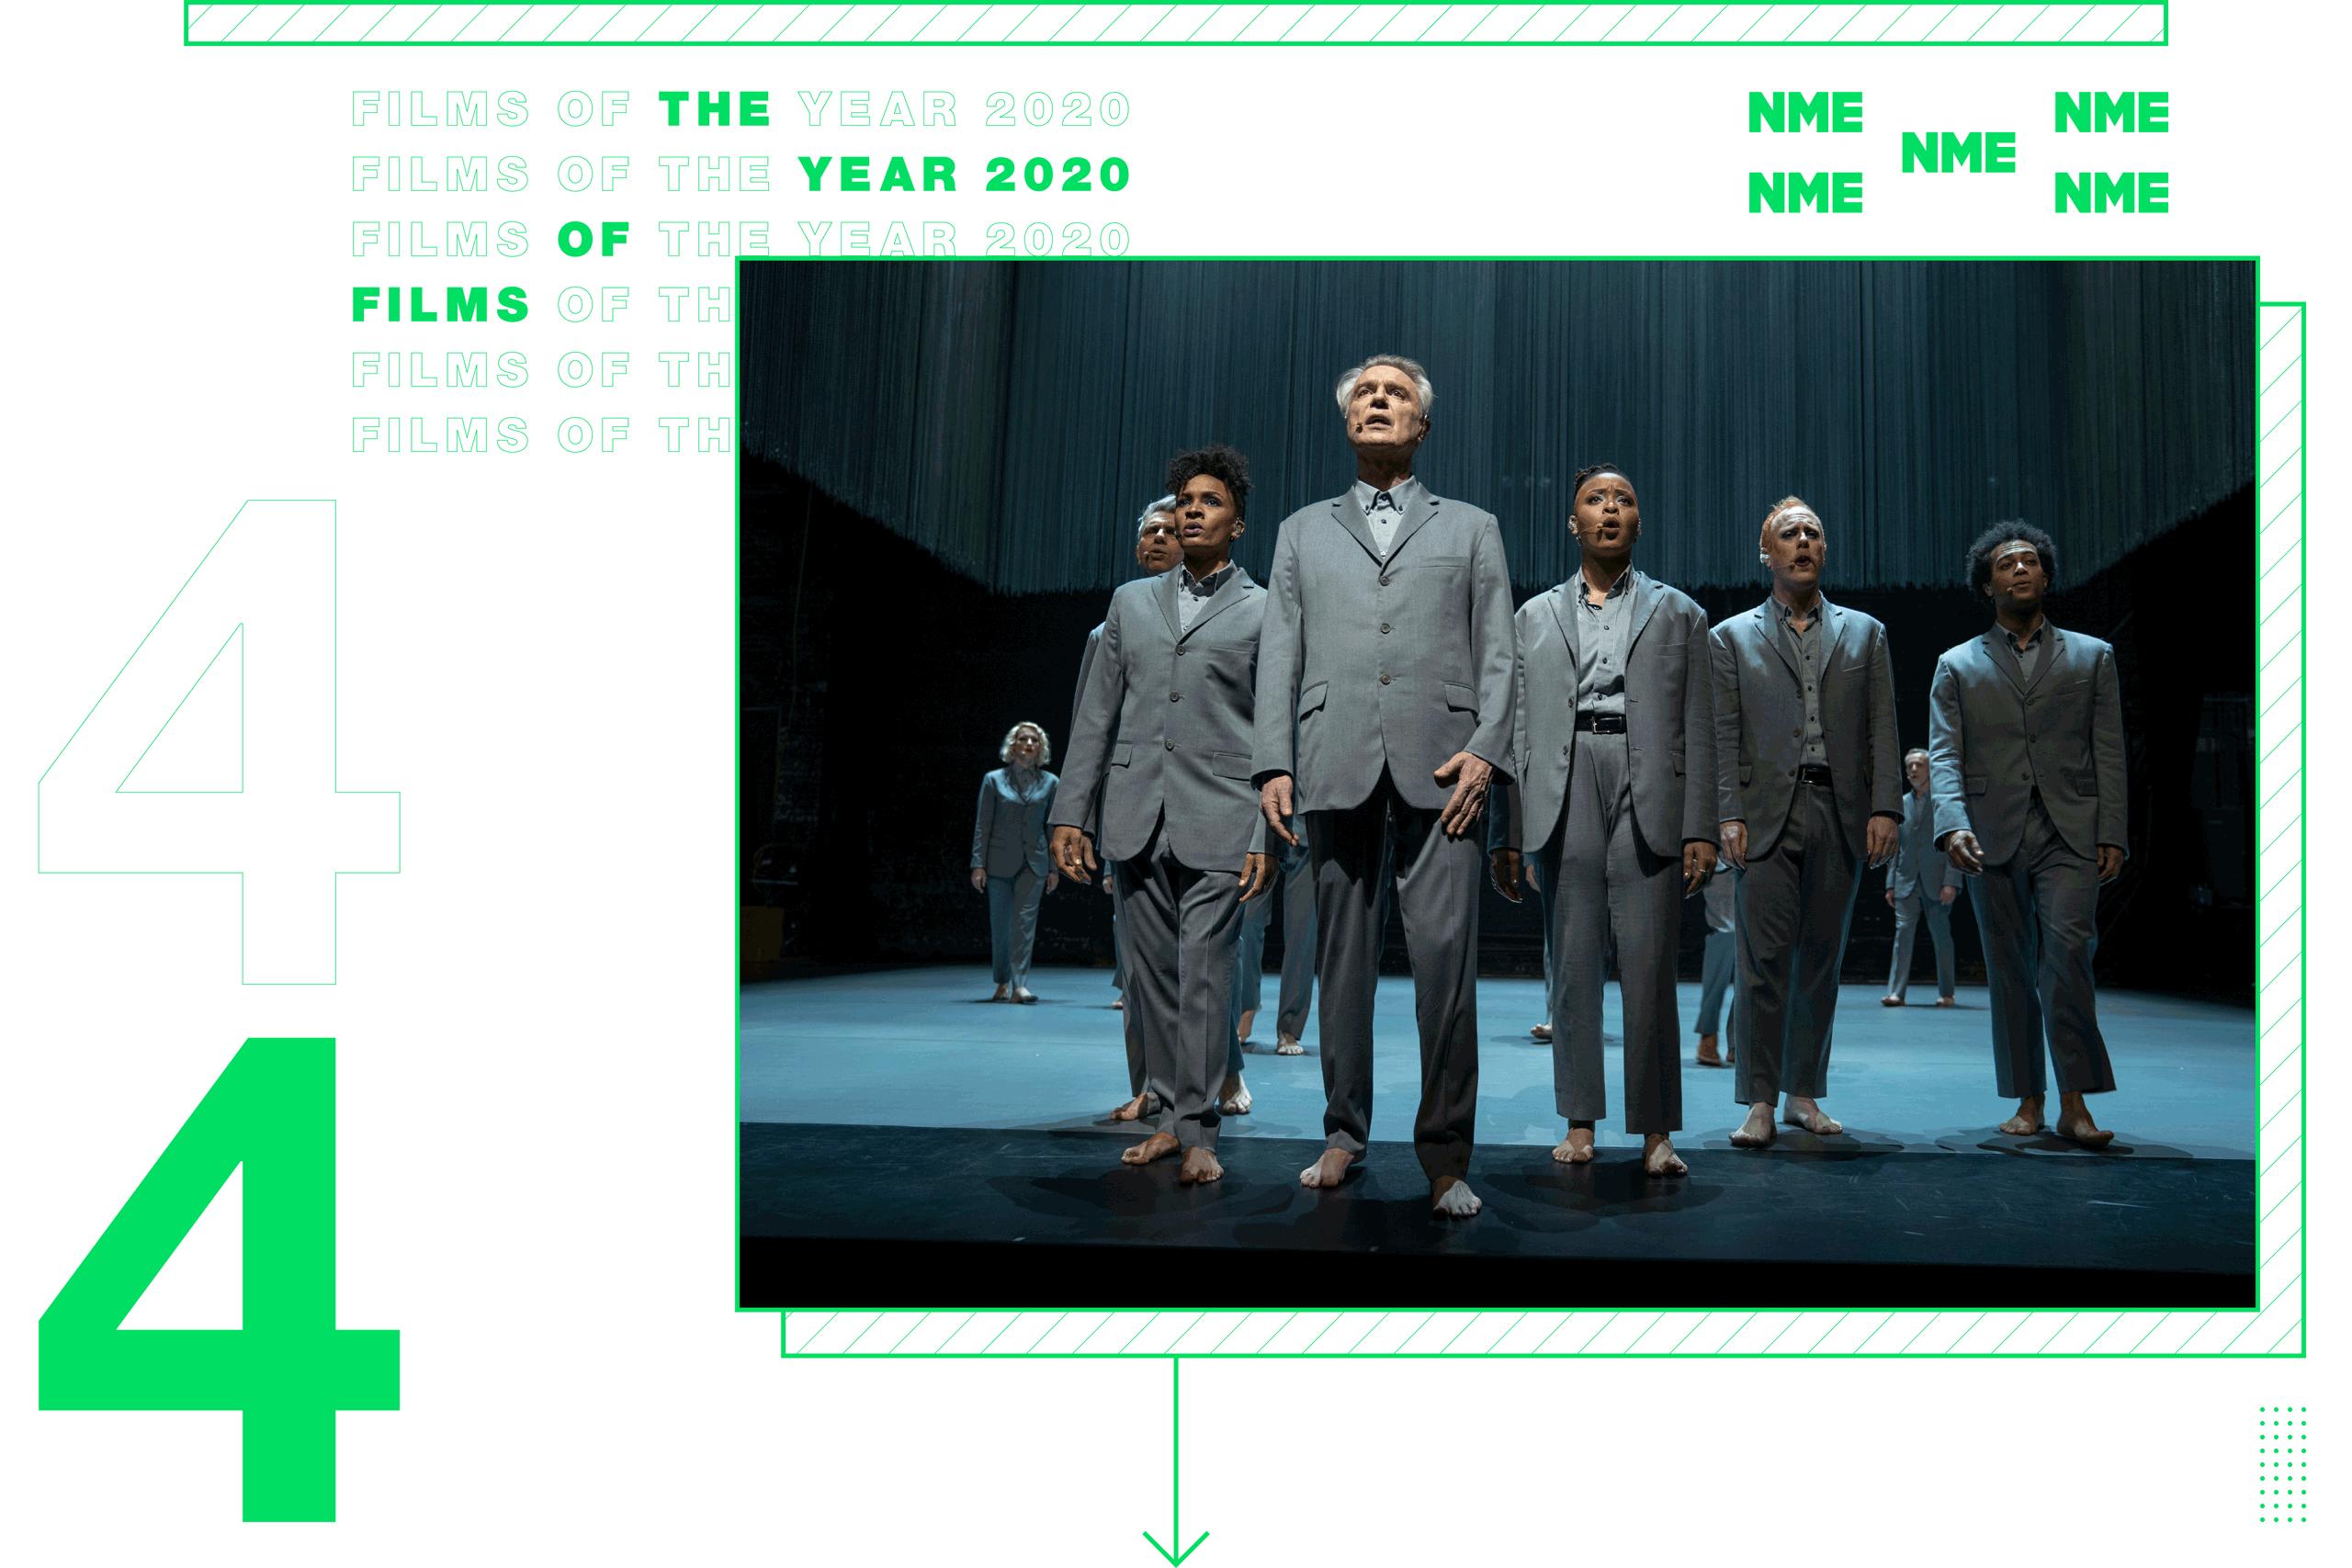 NME Global Films of the Year David Byrne's American Utopia